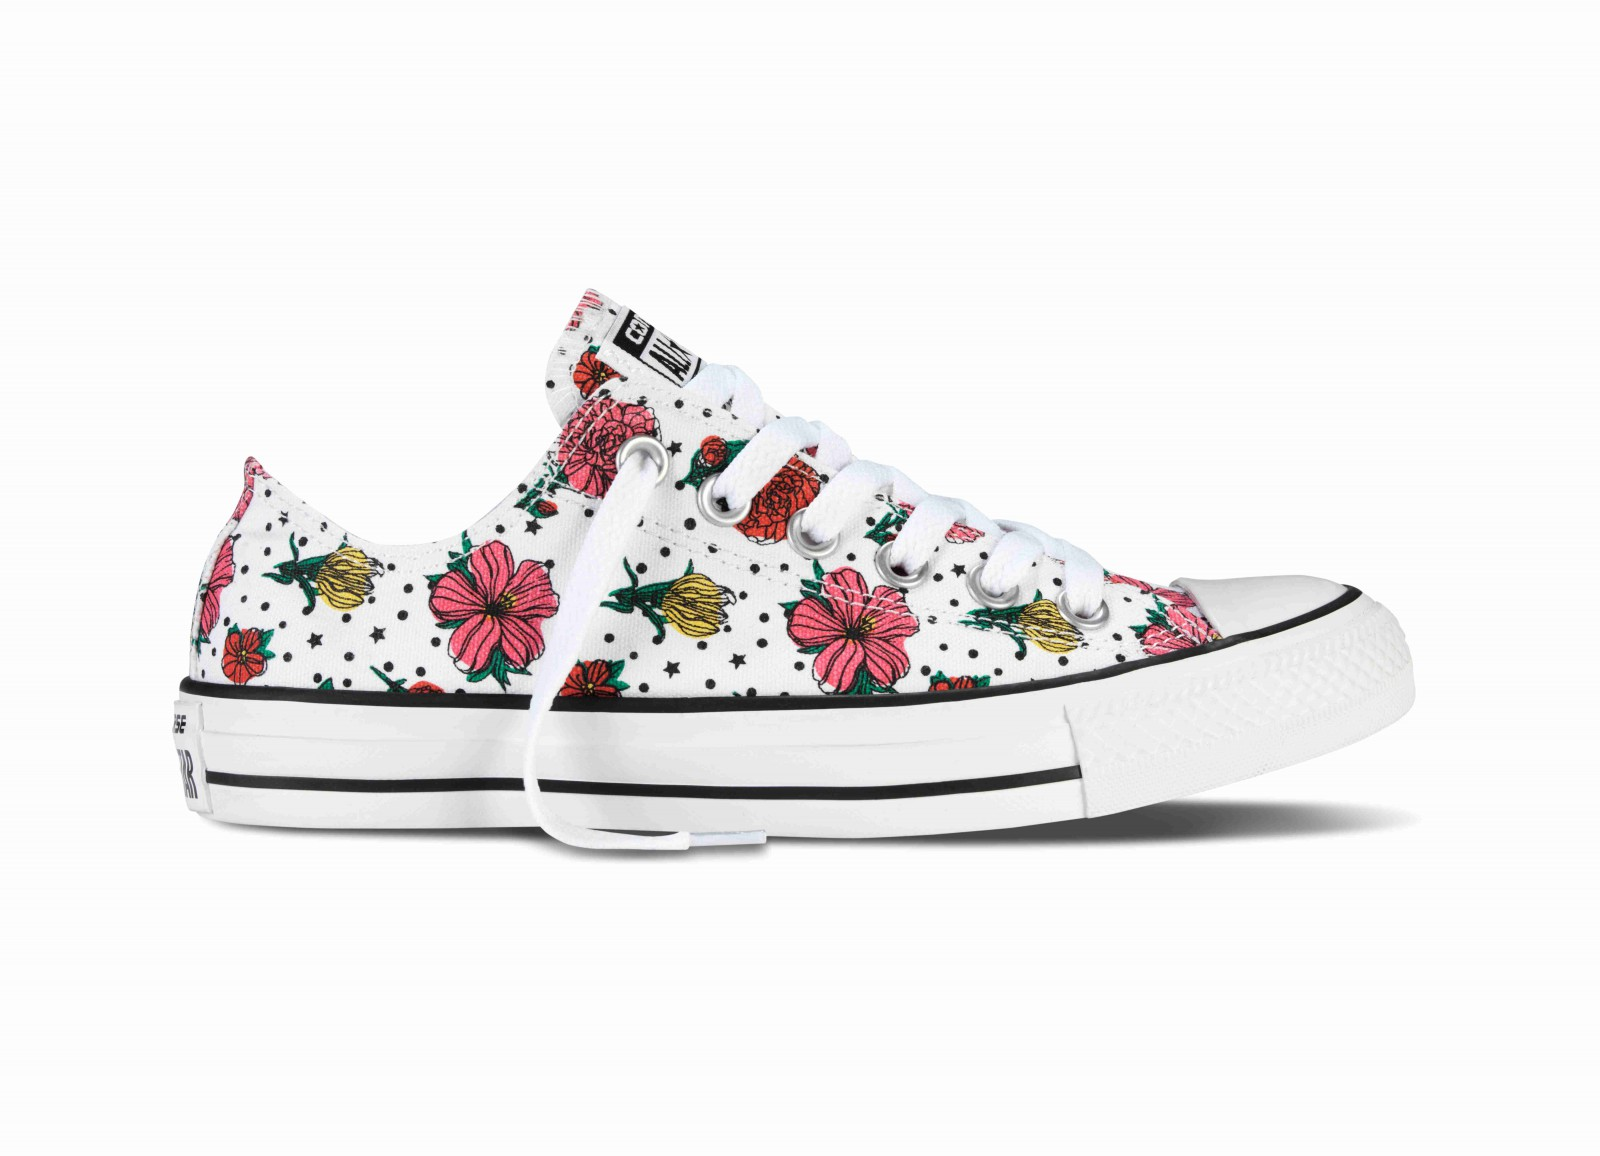 cea899eb204 Dámské boty Converse Chuck Taylor All Star květiny